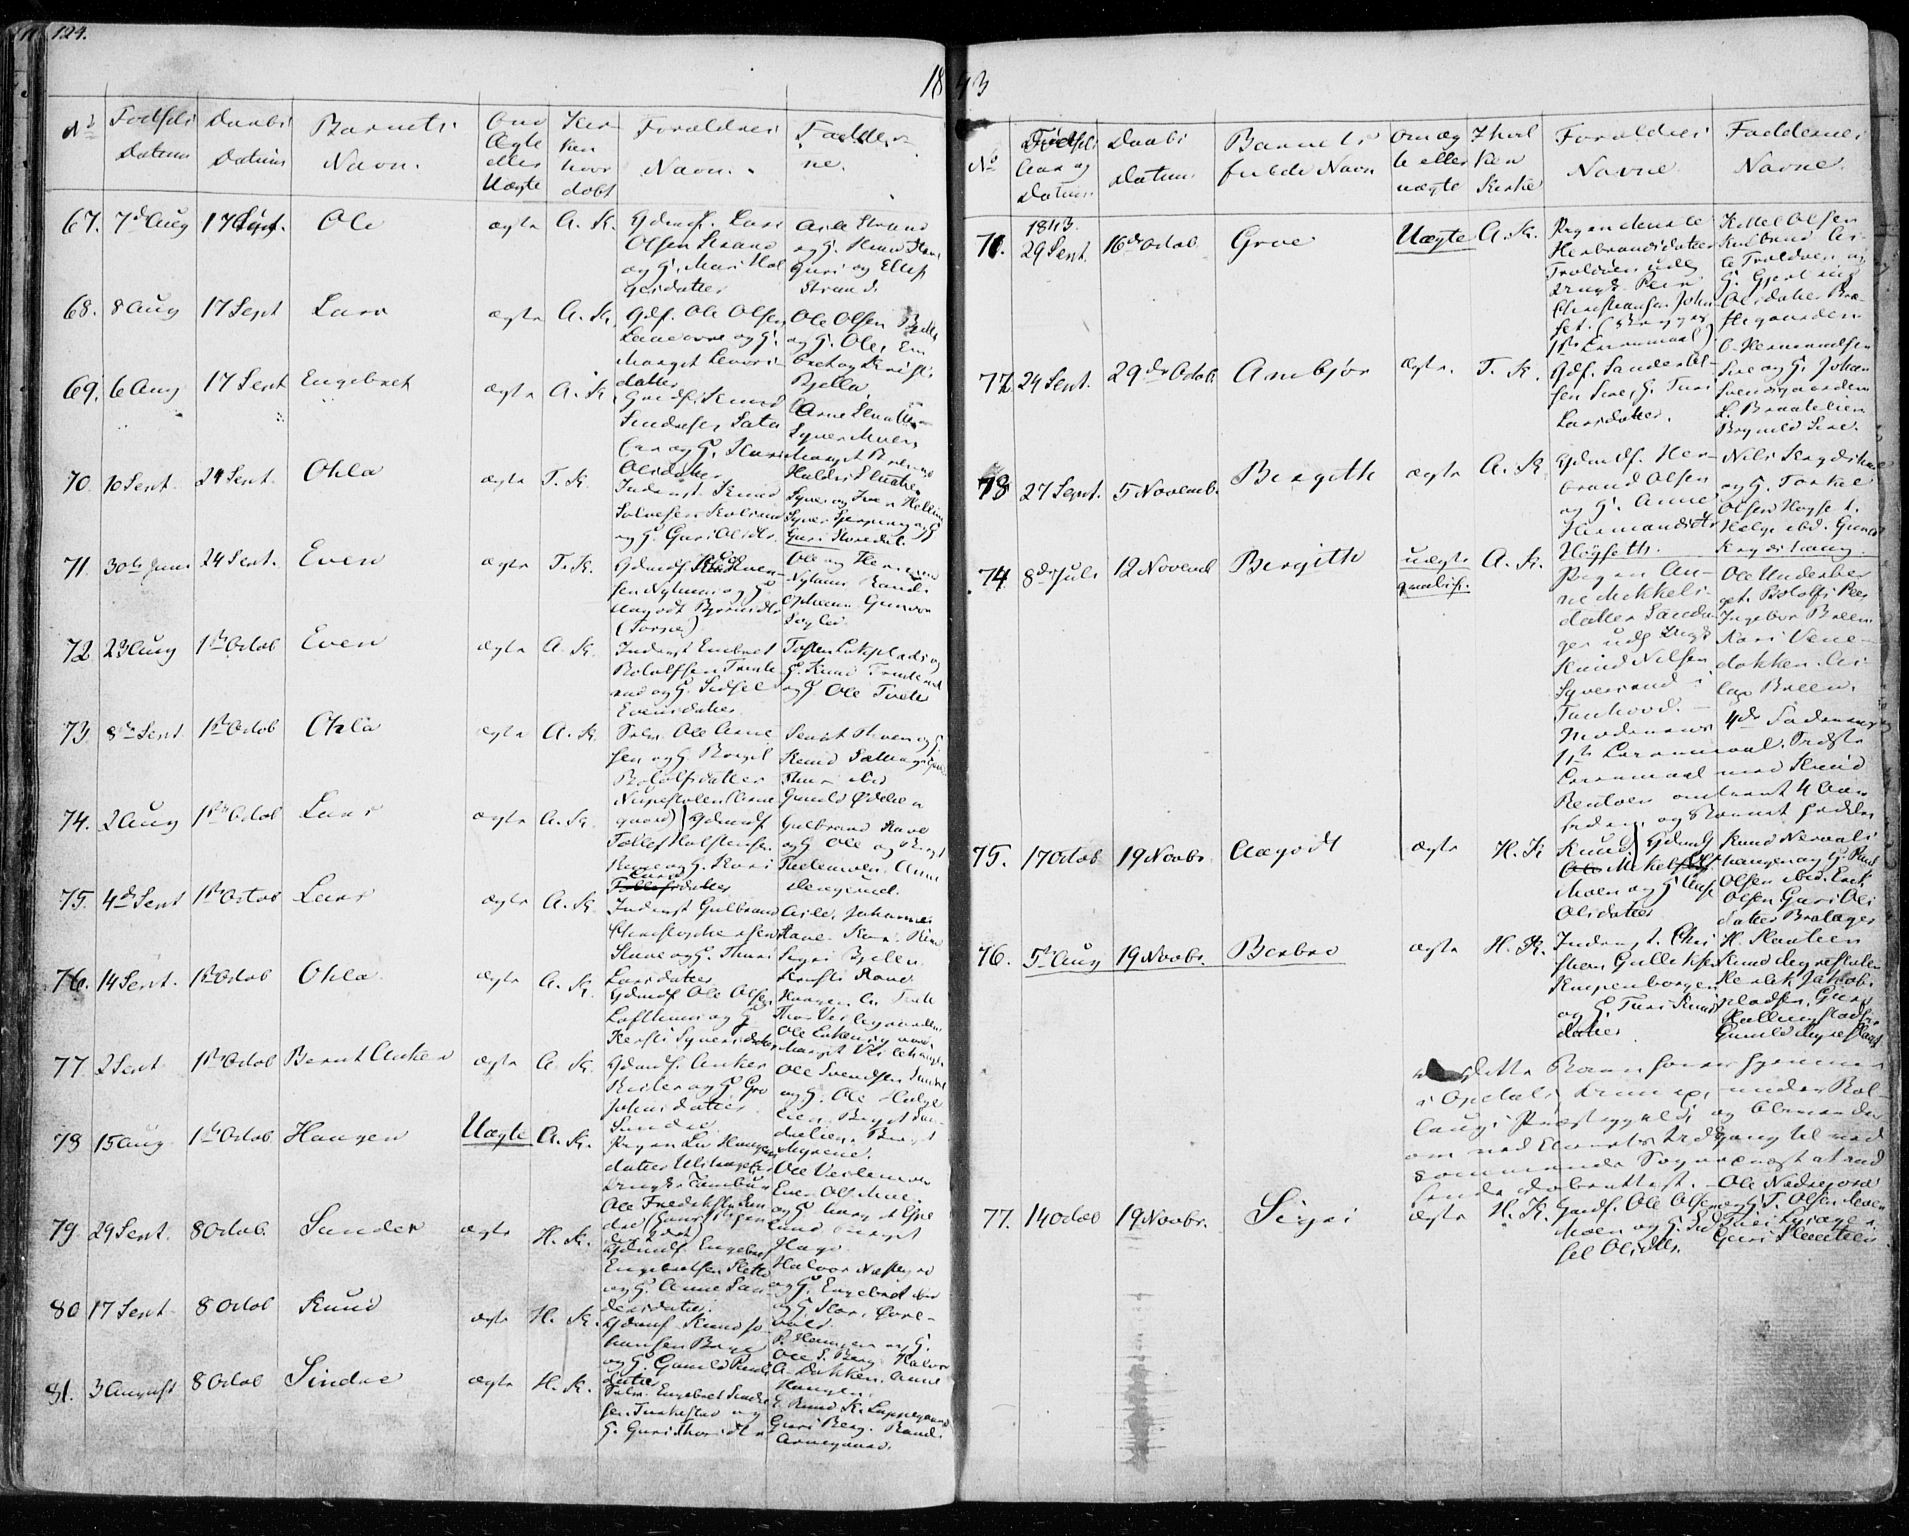 SAKO, Ål kirkebøker, F/Fa/L0005: Ministerialbok nr. I 5, 1825-1848, s. 124